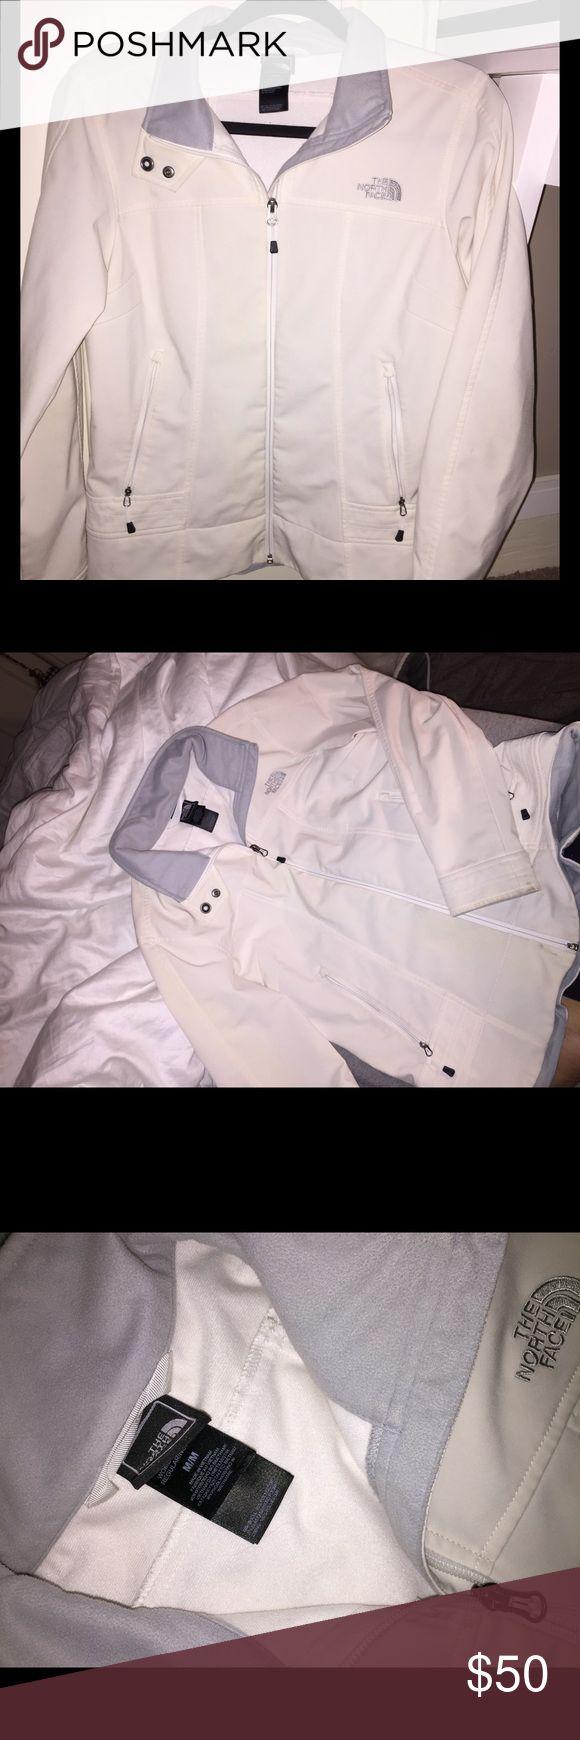 North Face Jacket Women's Medium White North Face zip up jacket, like new 😍 North Face Jackets & Coats Utility Jackets